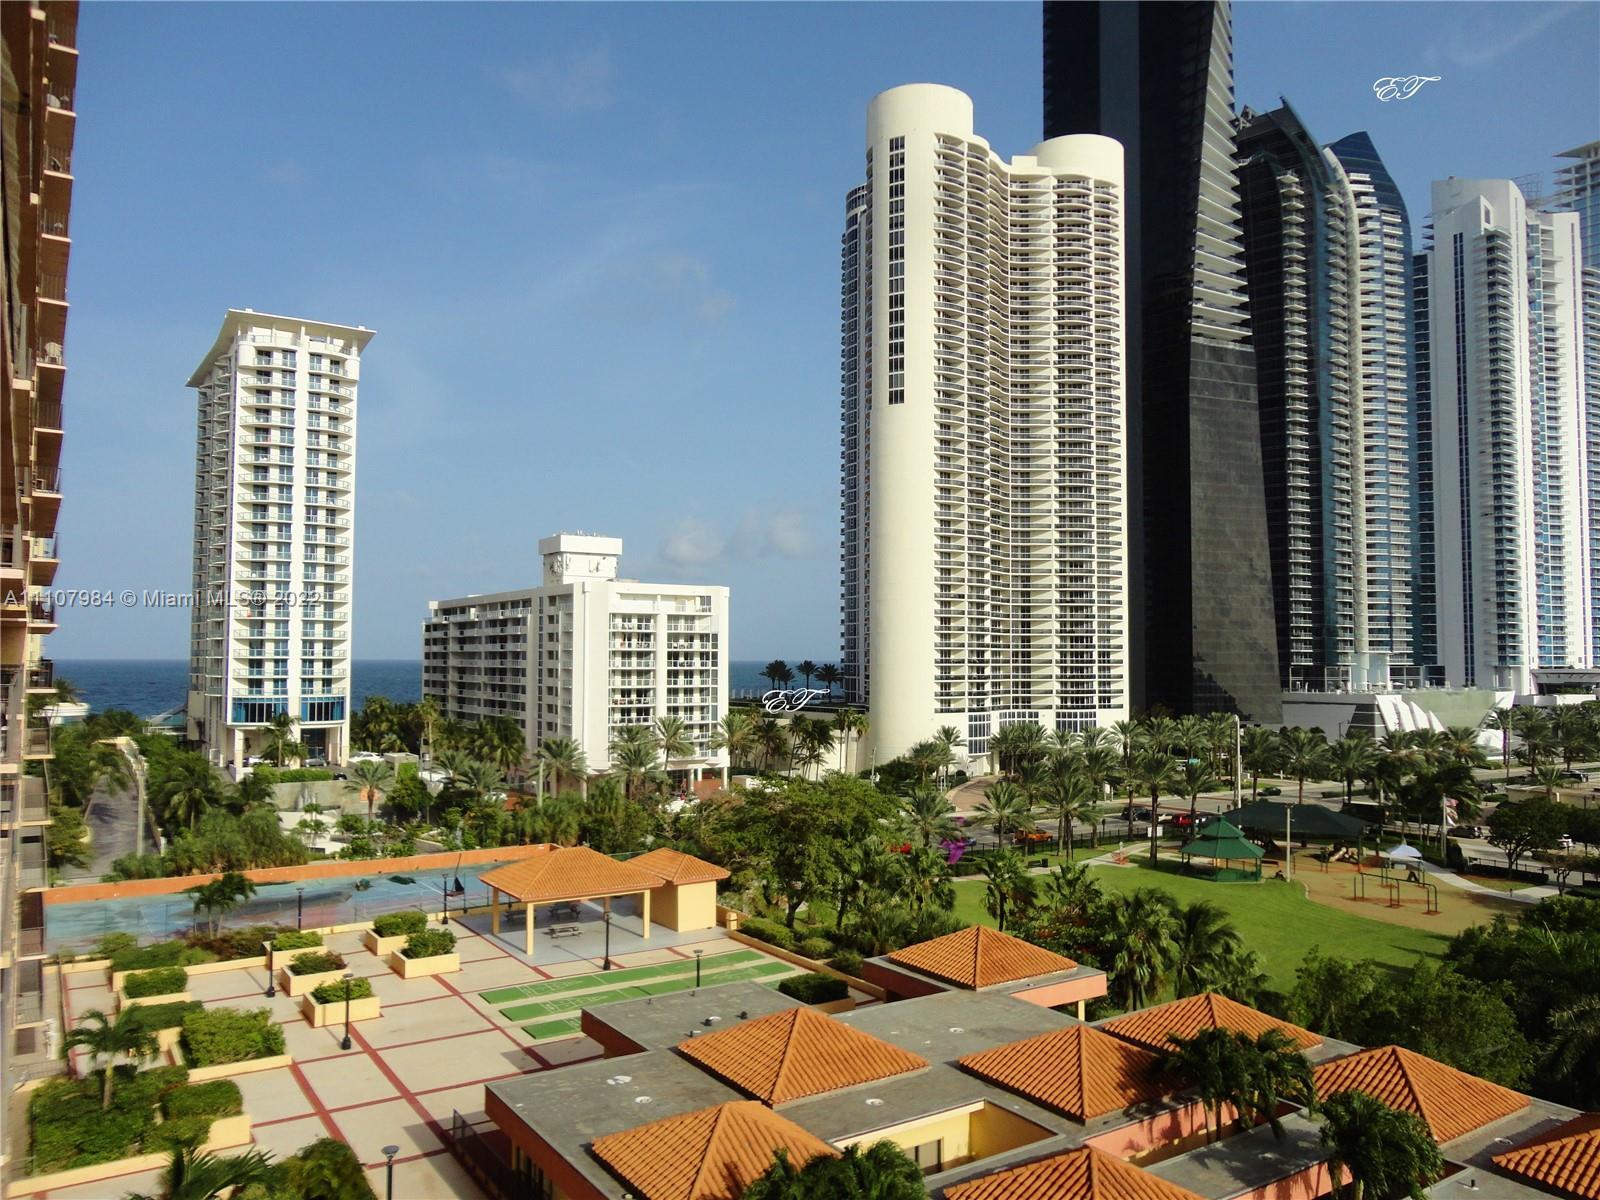 Winston Tower 600 #906 - 210 174 St #906, Sunny Isles Beach, FL 33160